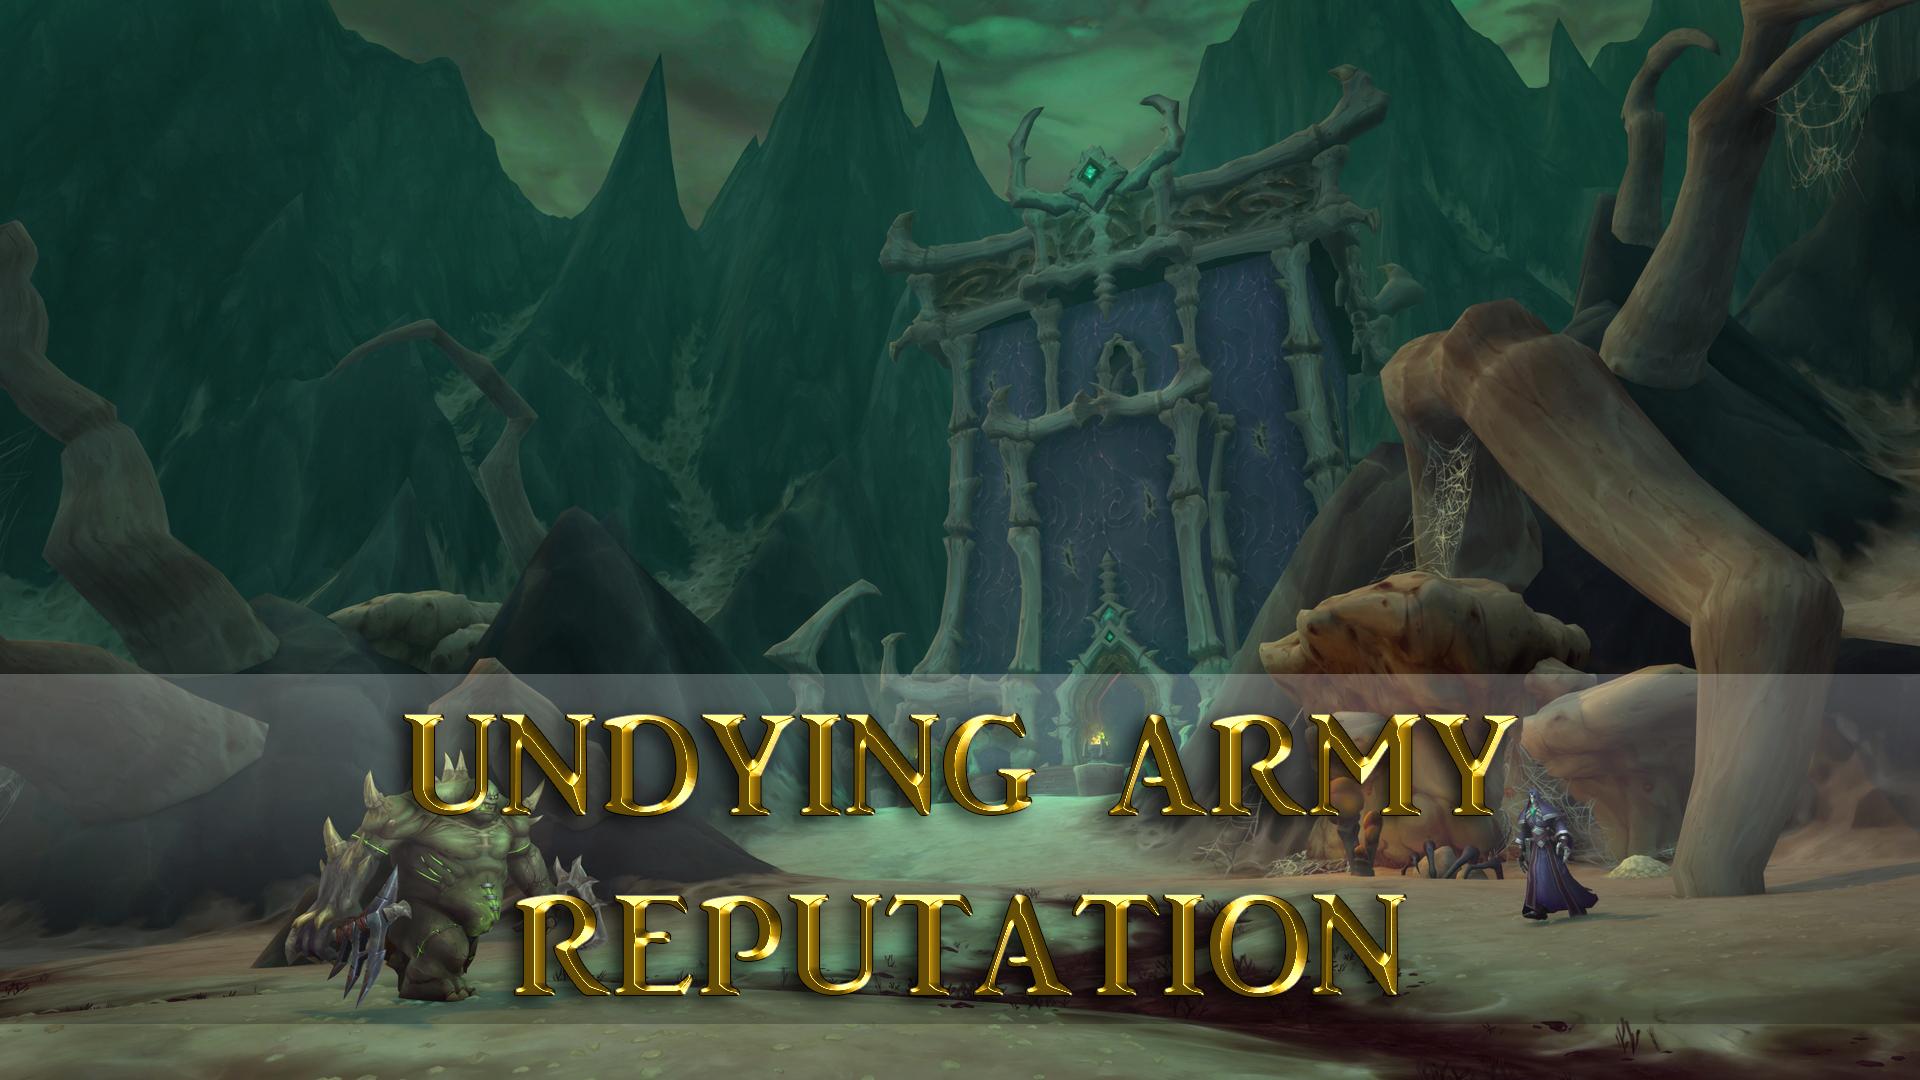 Undying Army Reputation GBD - e2p.com